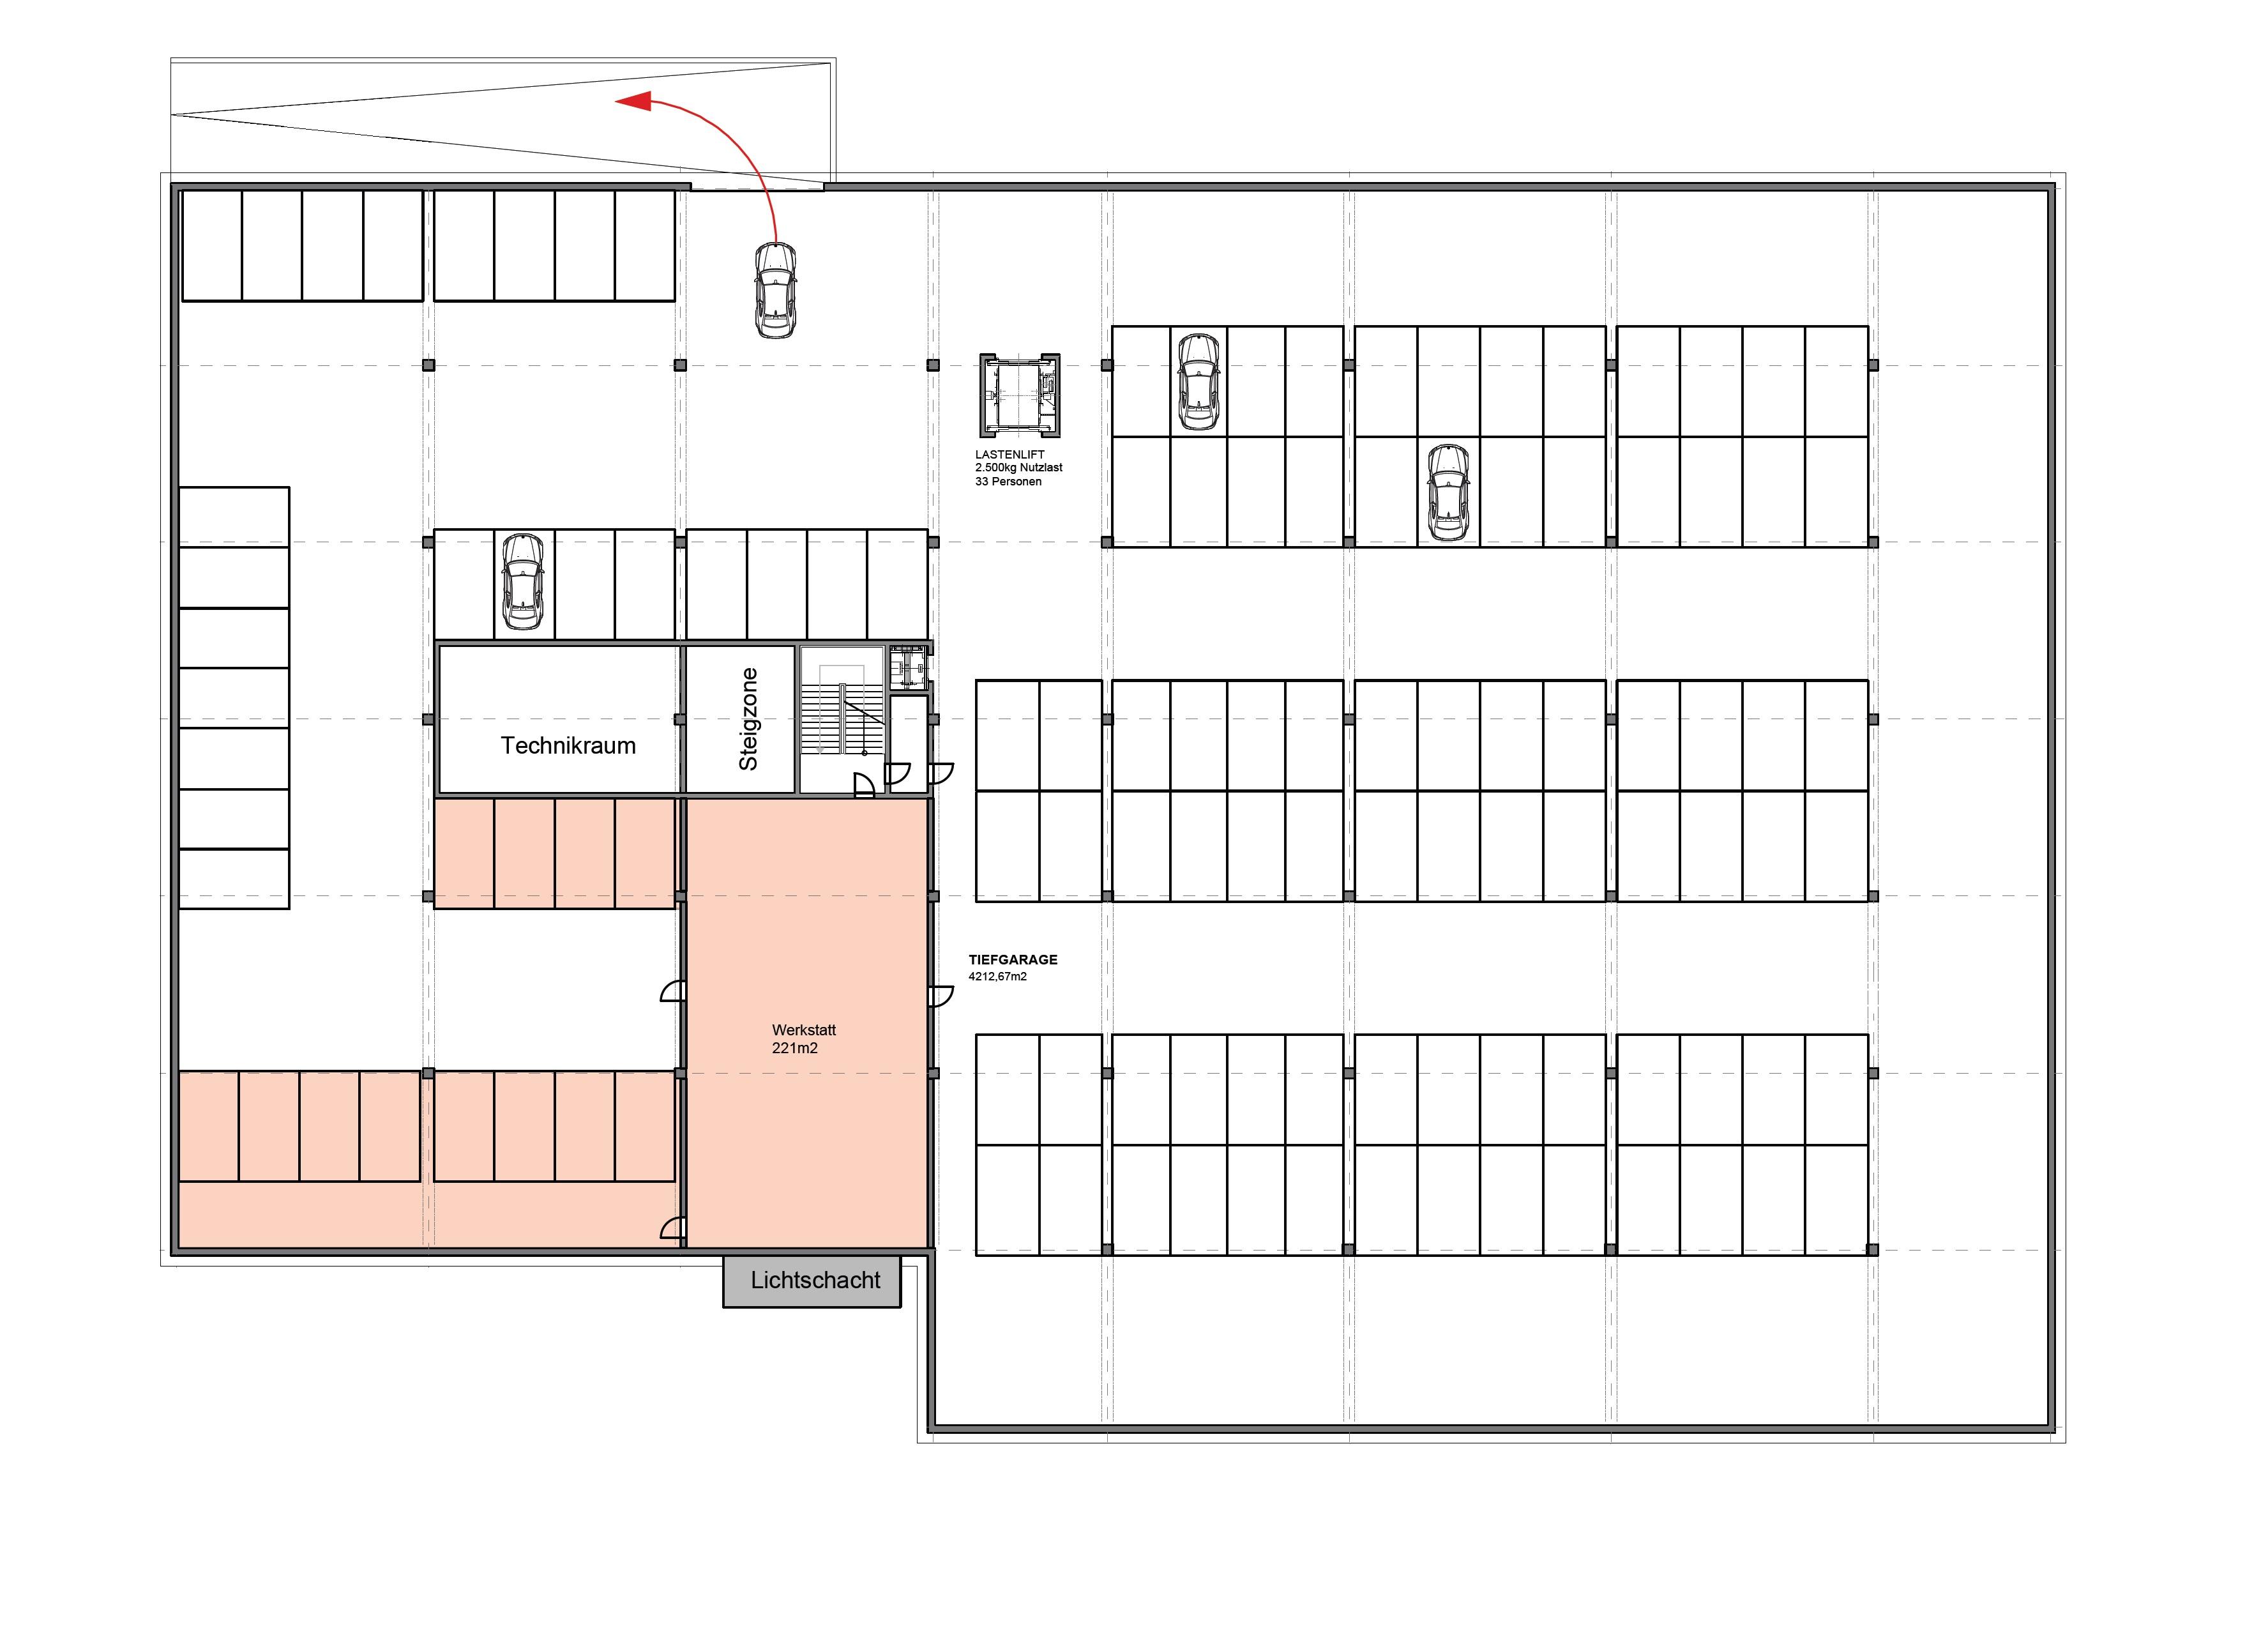 tiefgarage calandapark. Black Bedroom Furniture Sets. Home Design Ideas